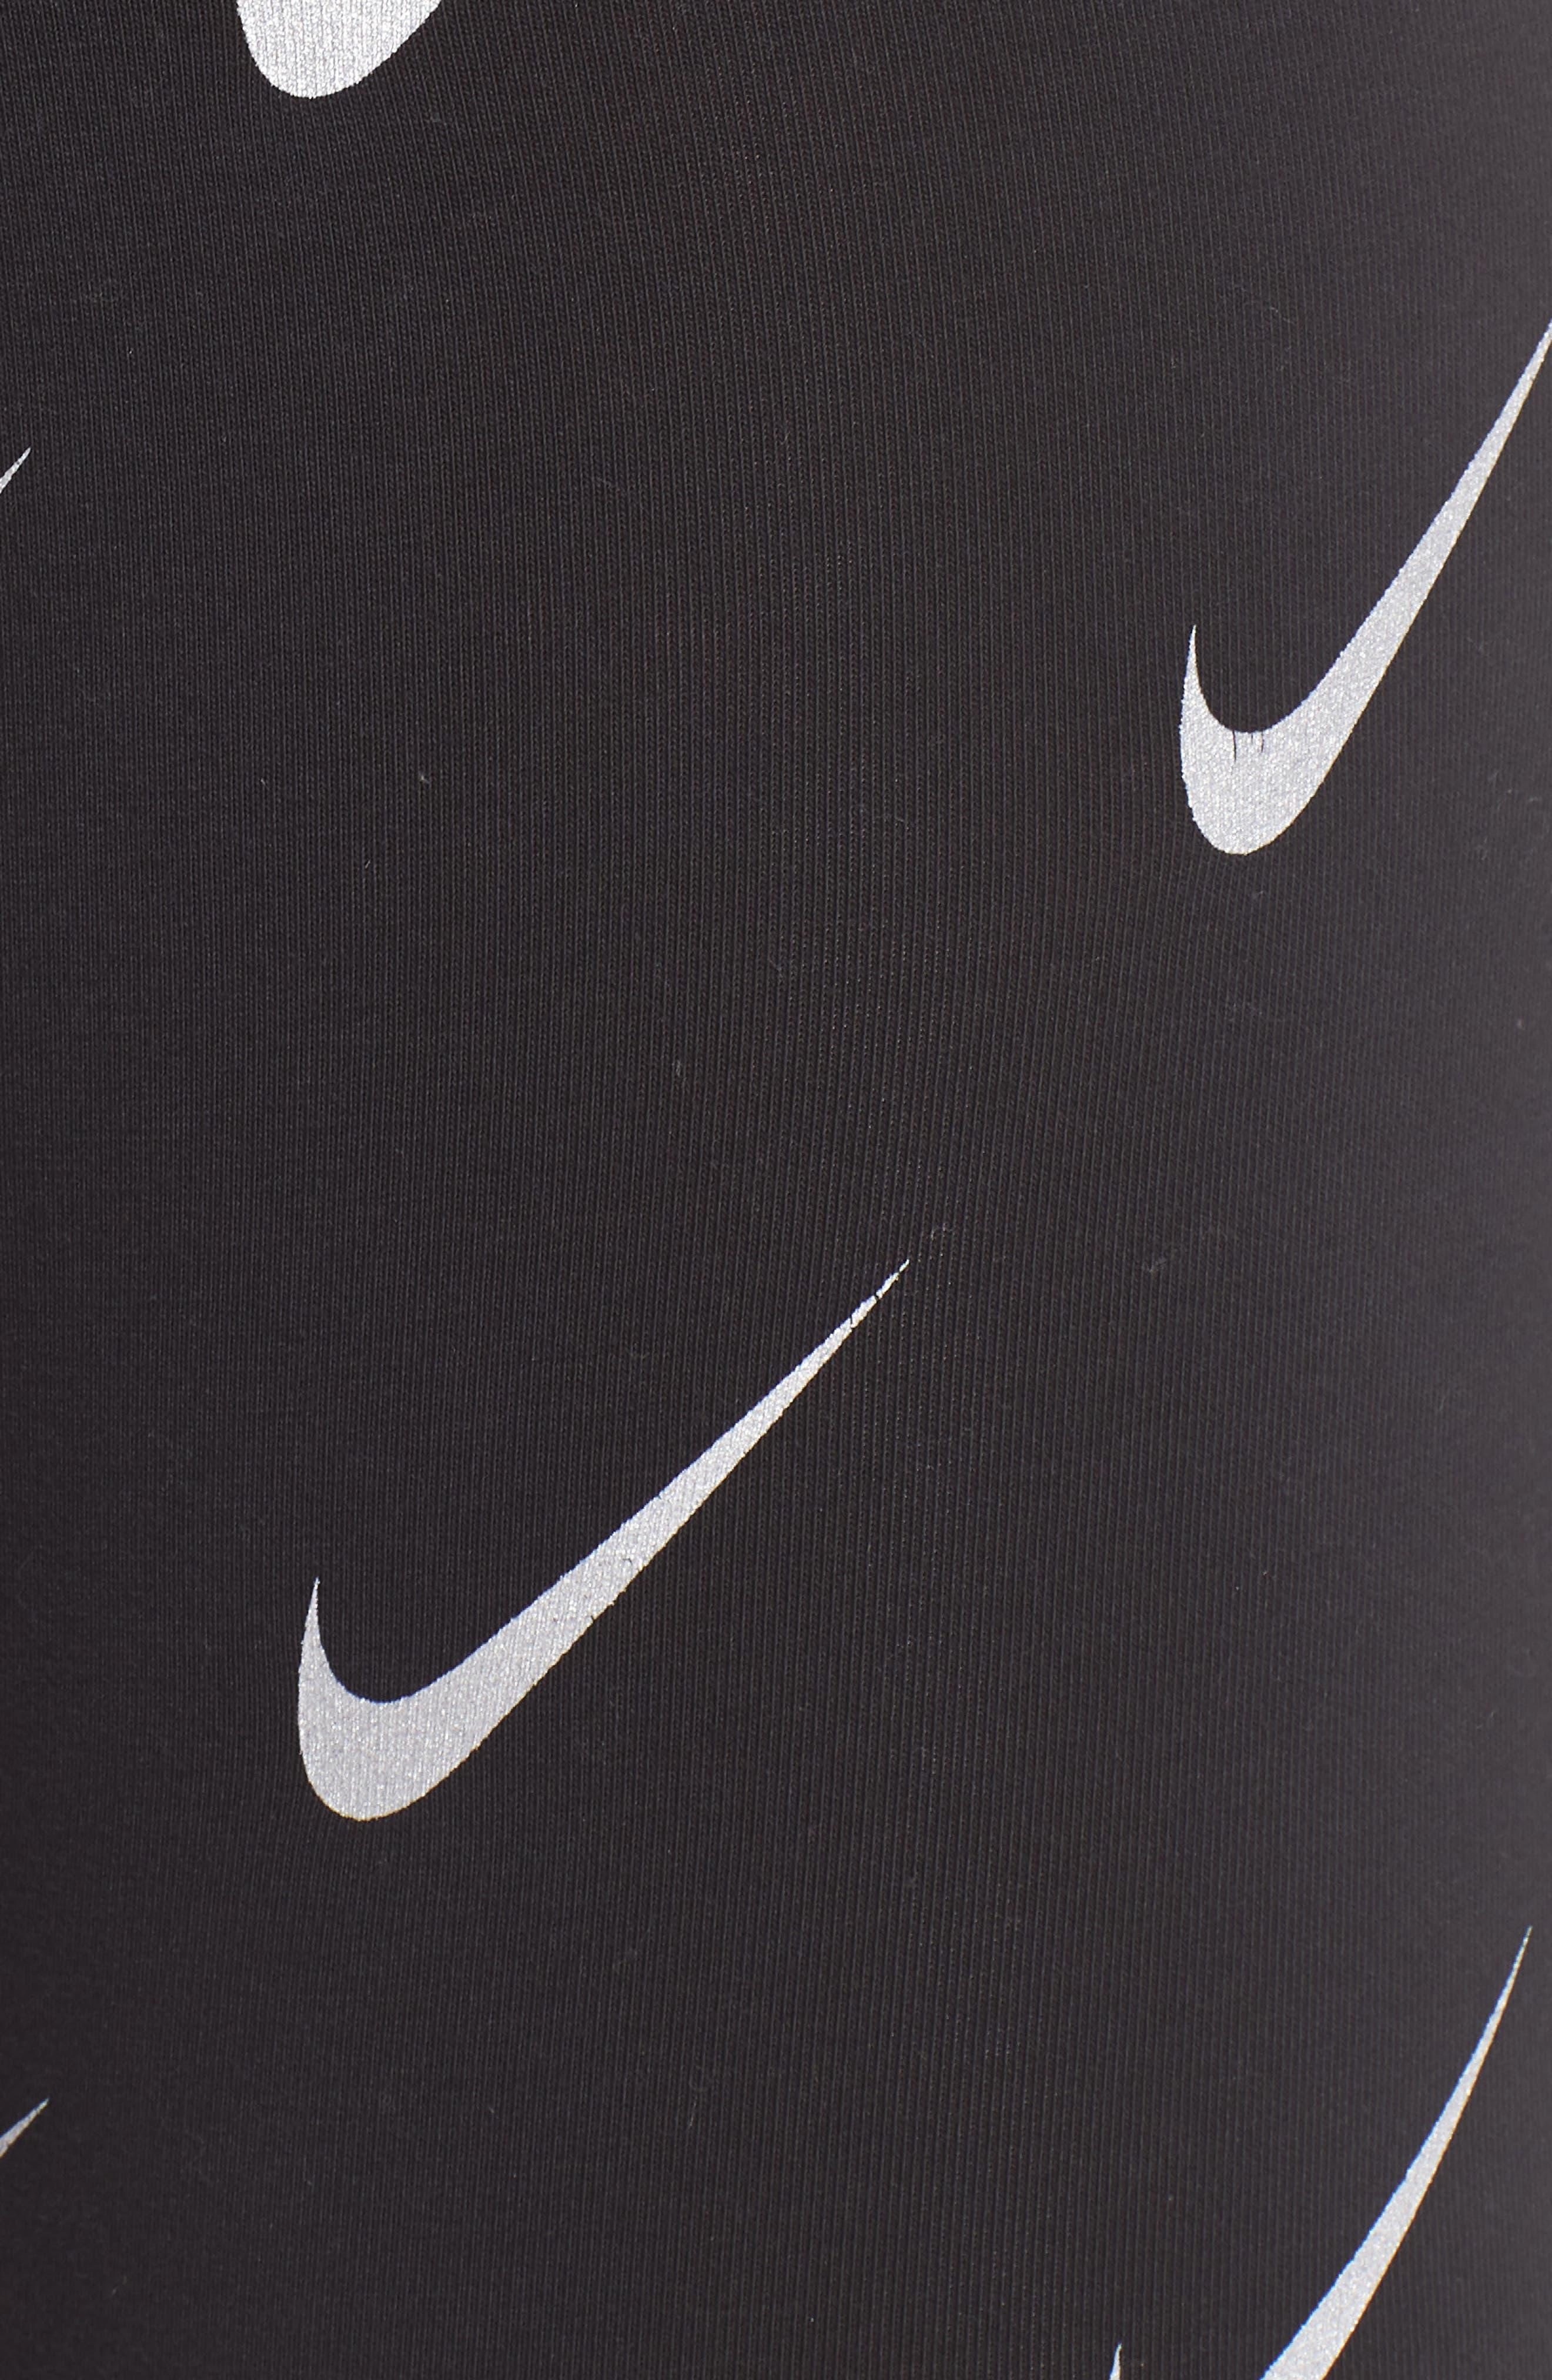 Sportswear Leg-A-See High Rise Print Leggings,                             Alternate thumbnail 6, color,                             BLACK